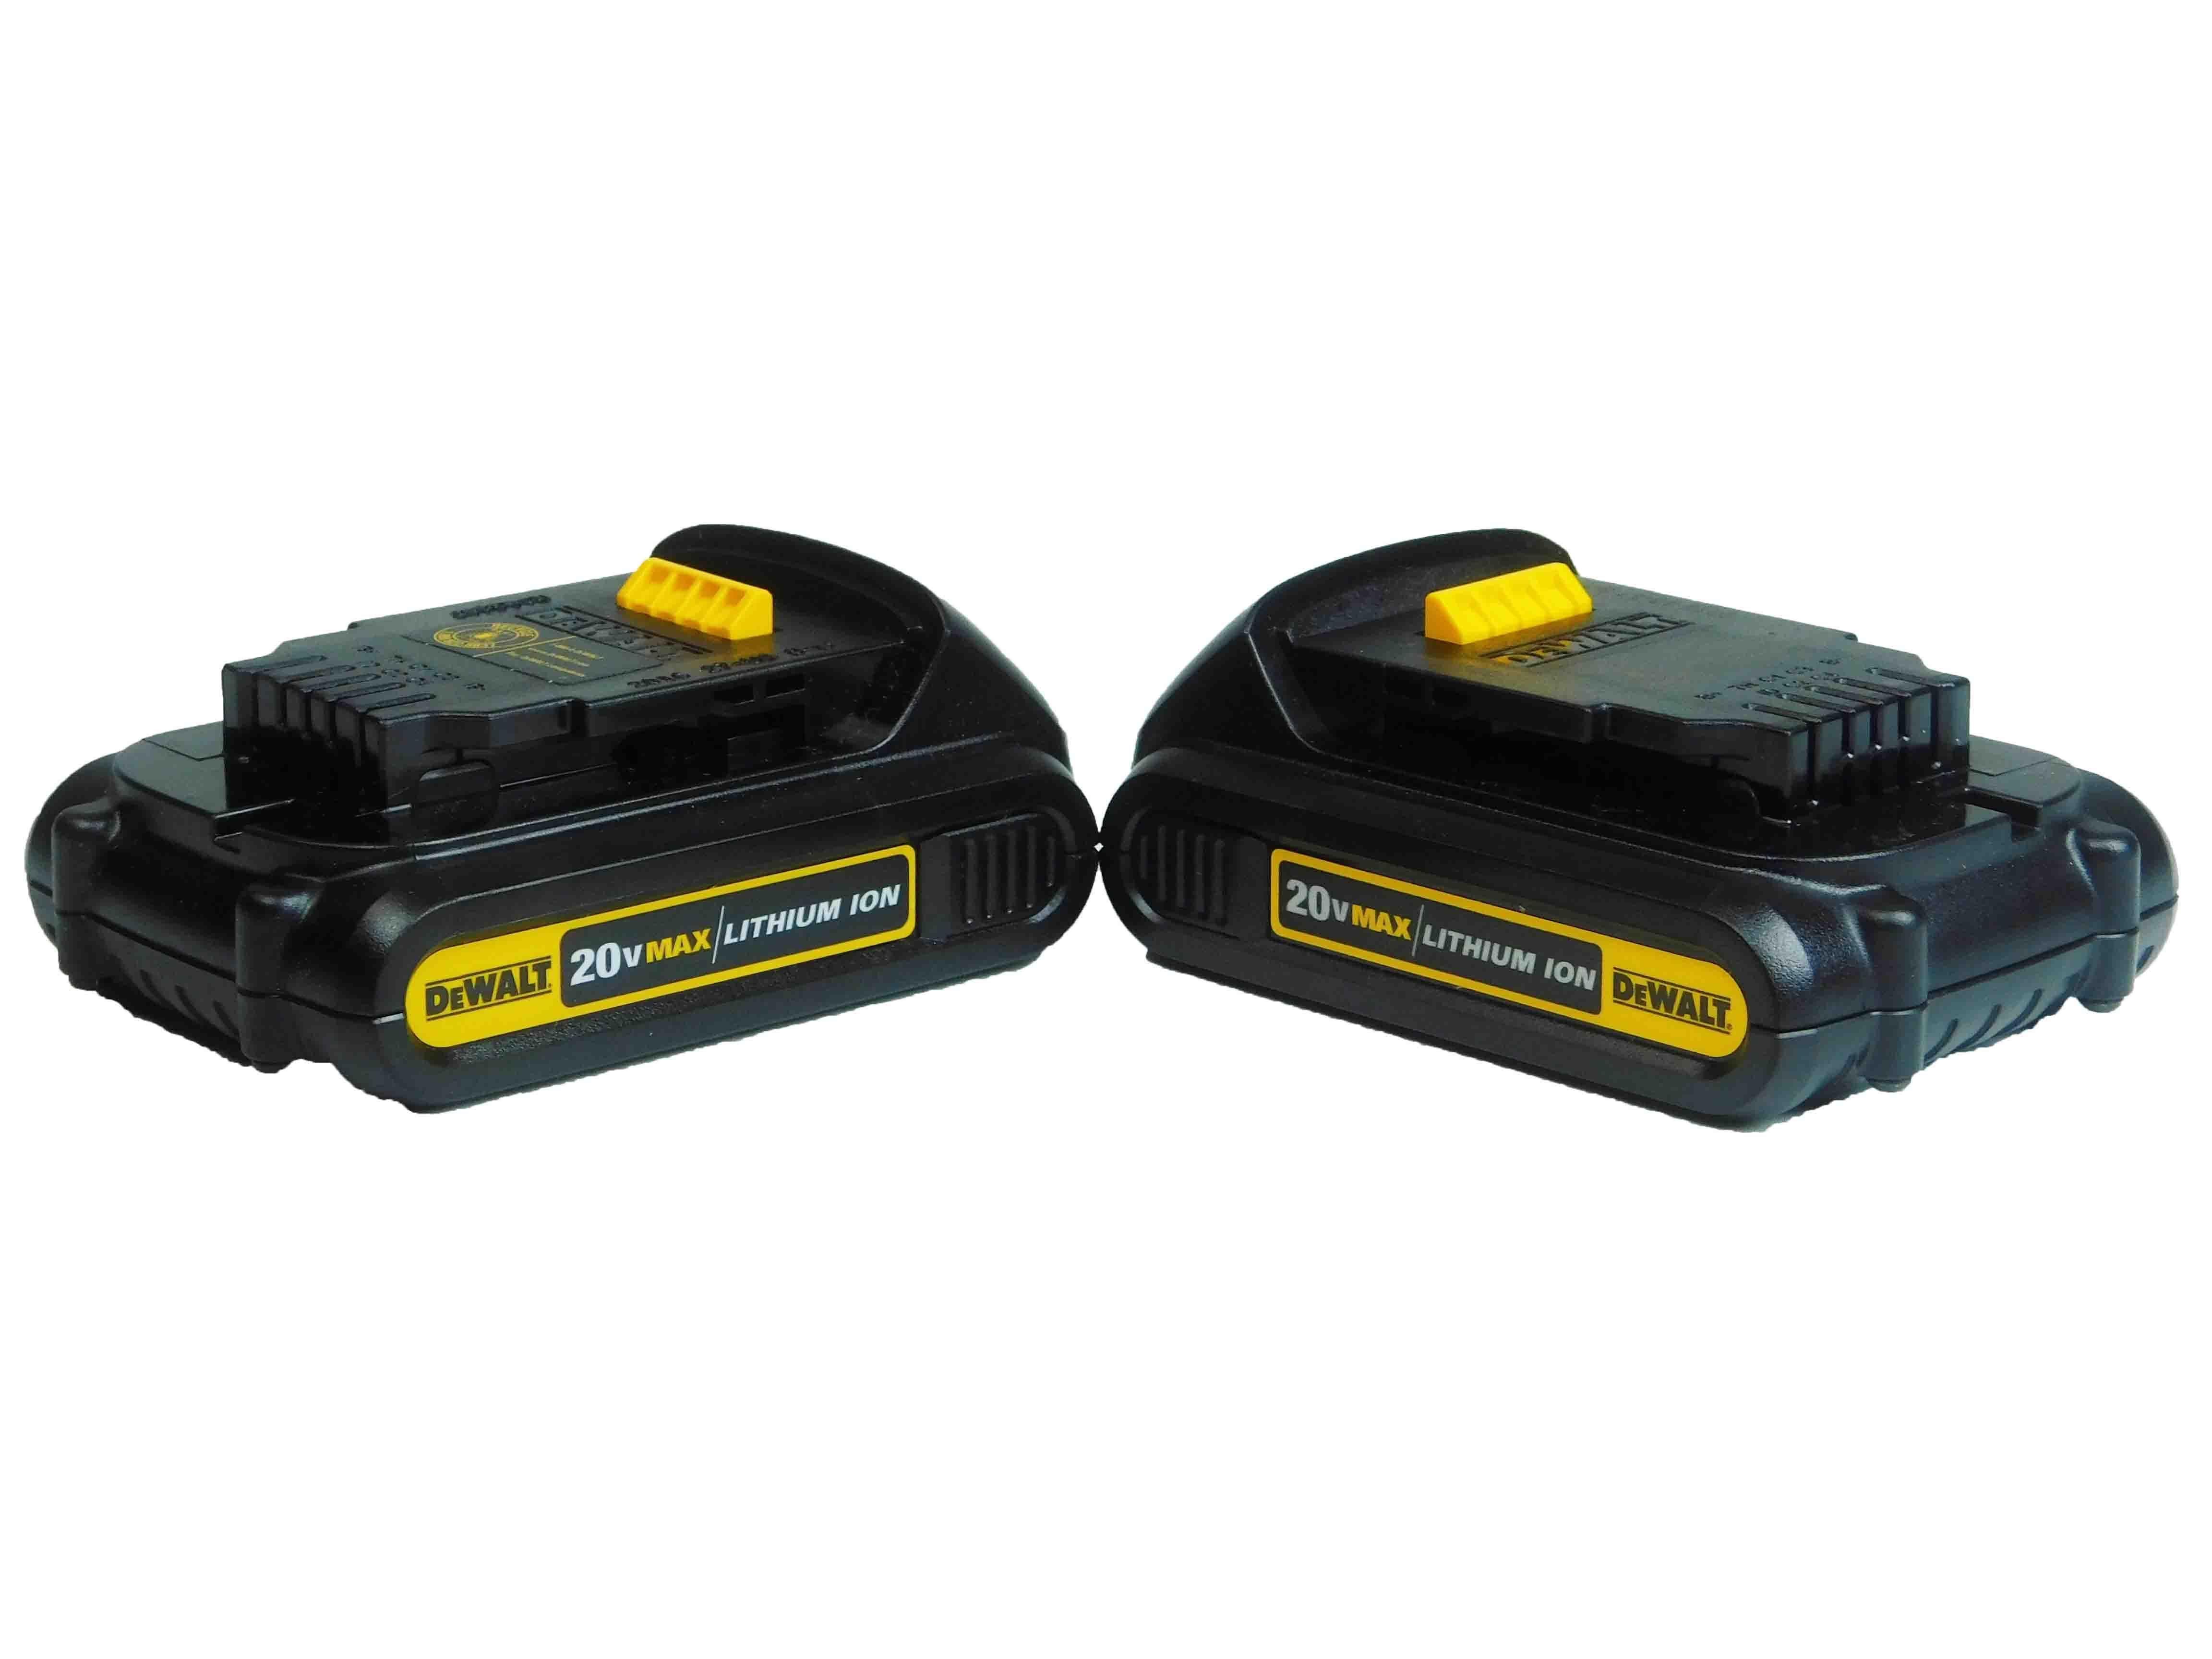 Dewalt Dcb201 20 Volt Max Li Ion Battery Pack 1 5ah Dcb201 Battery Battery Pack Dewalt